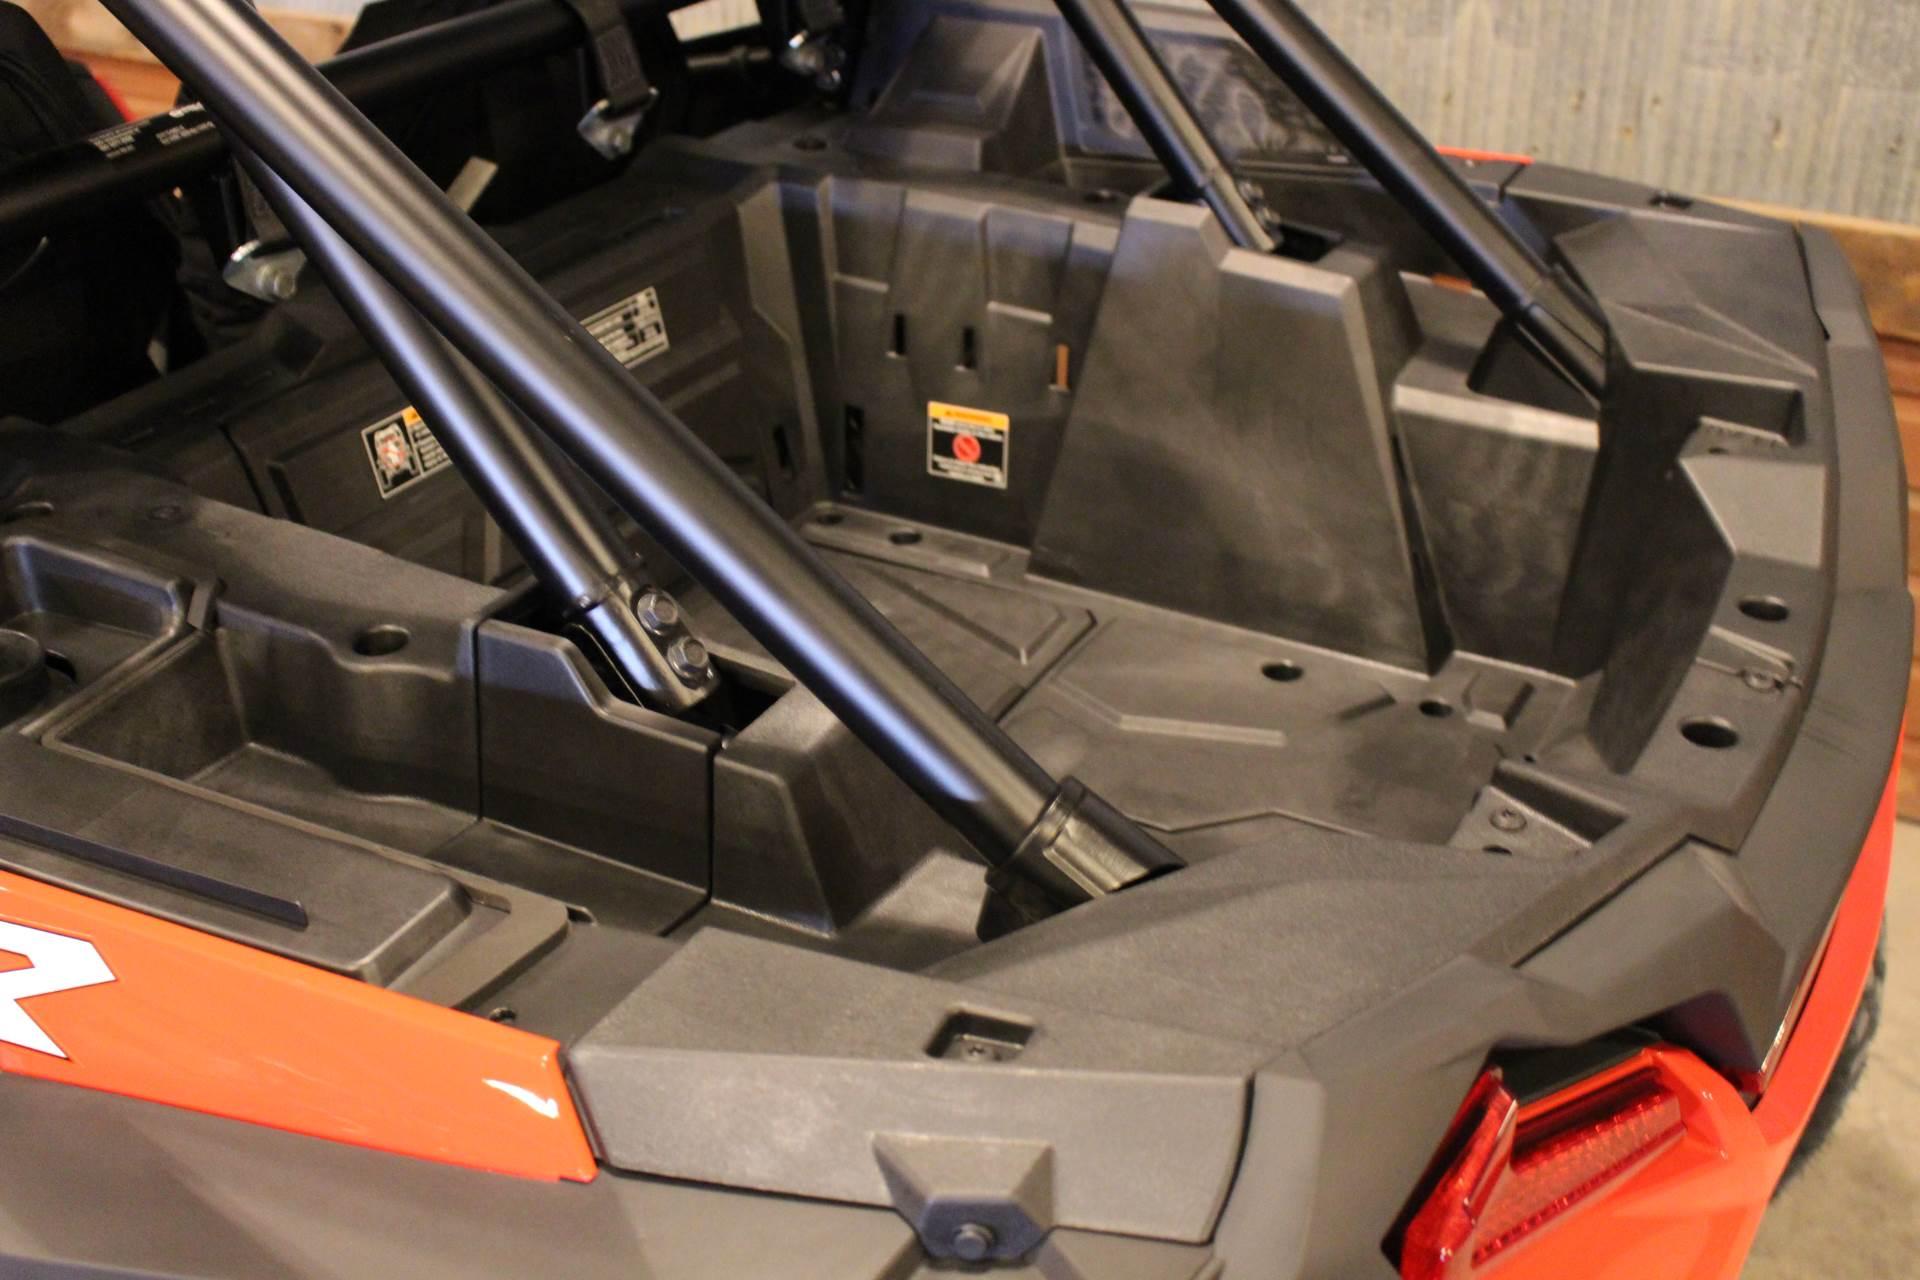 2018 Polaris RZR XP Turbo S 10